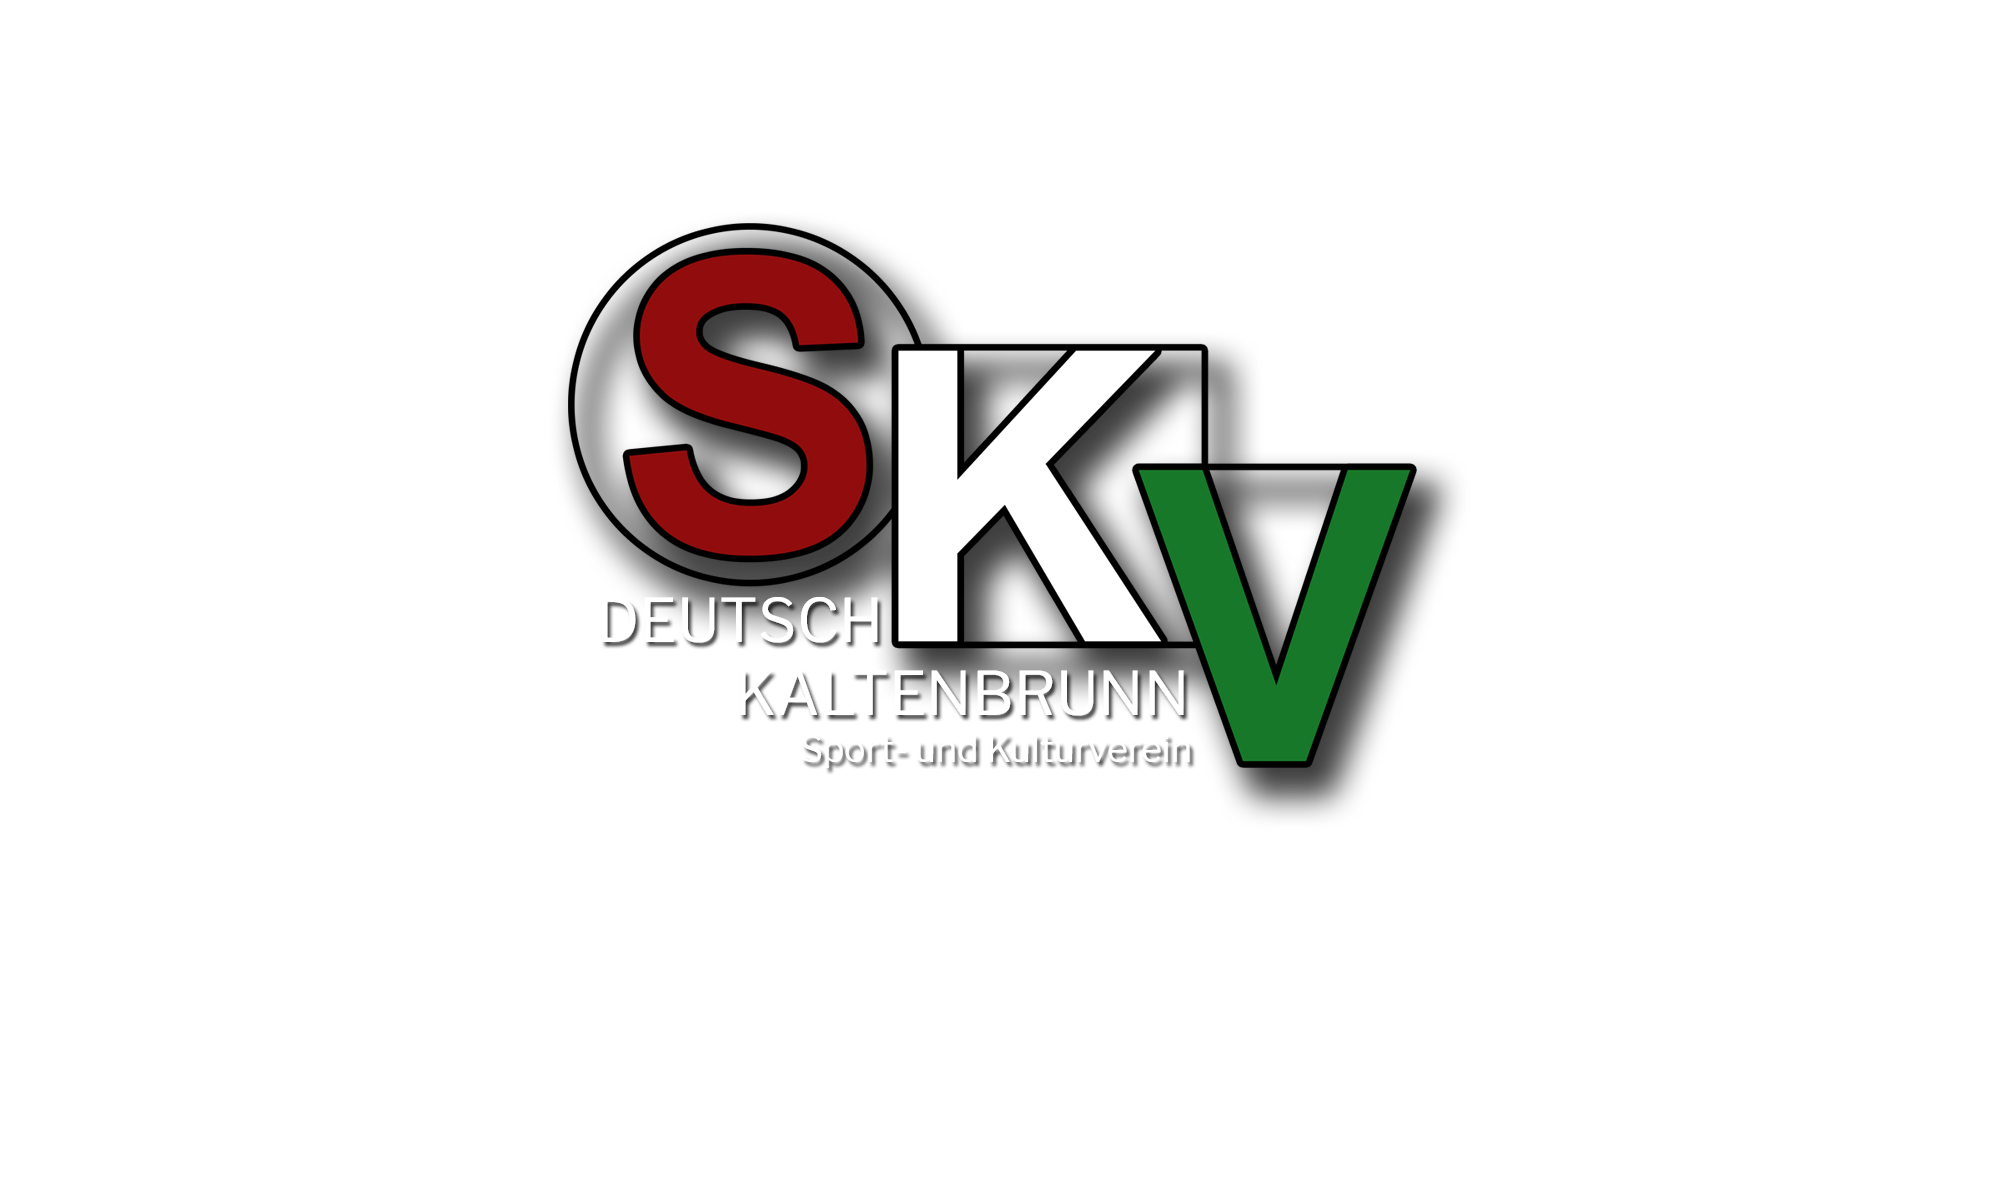 SKV-DK